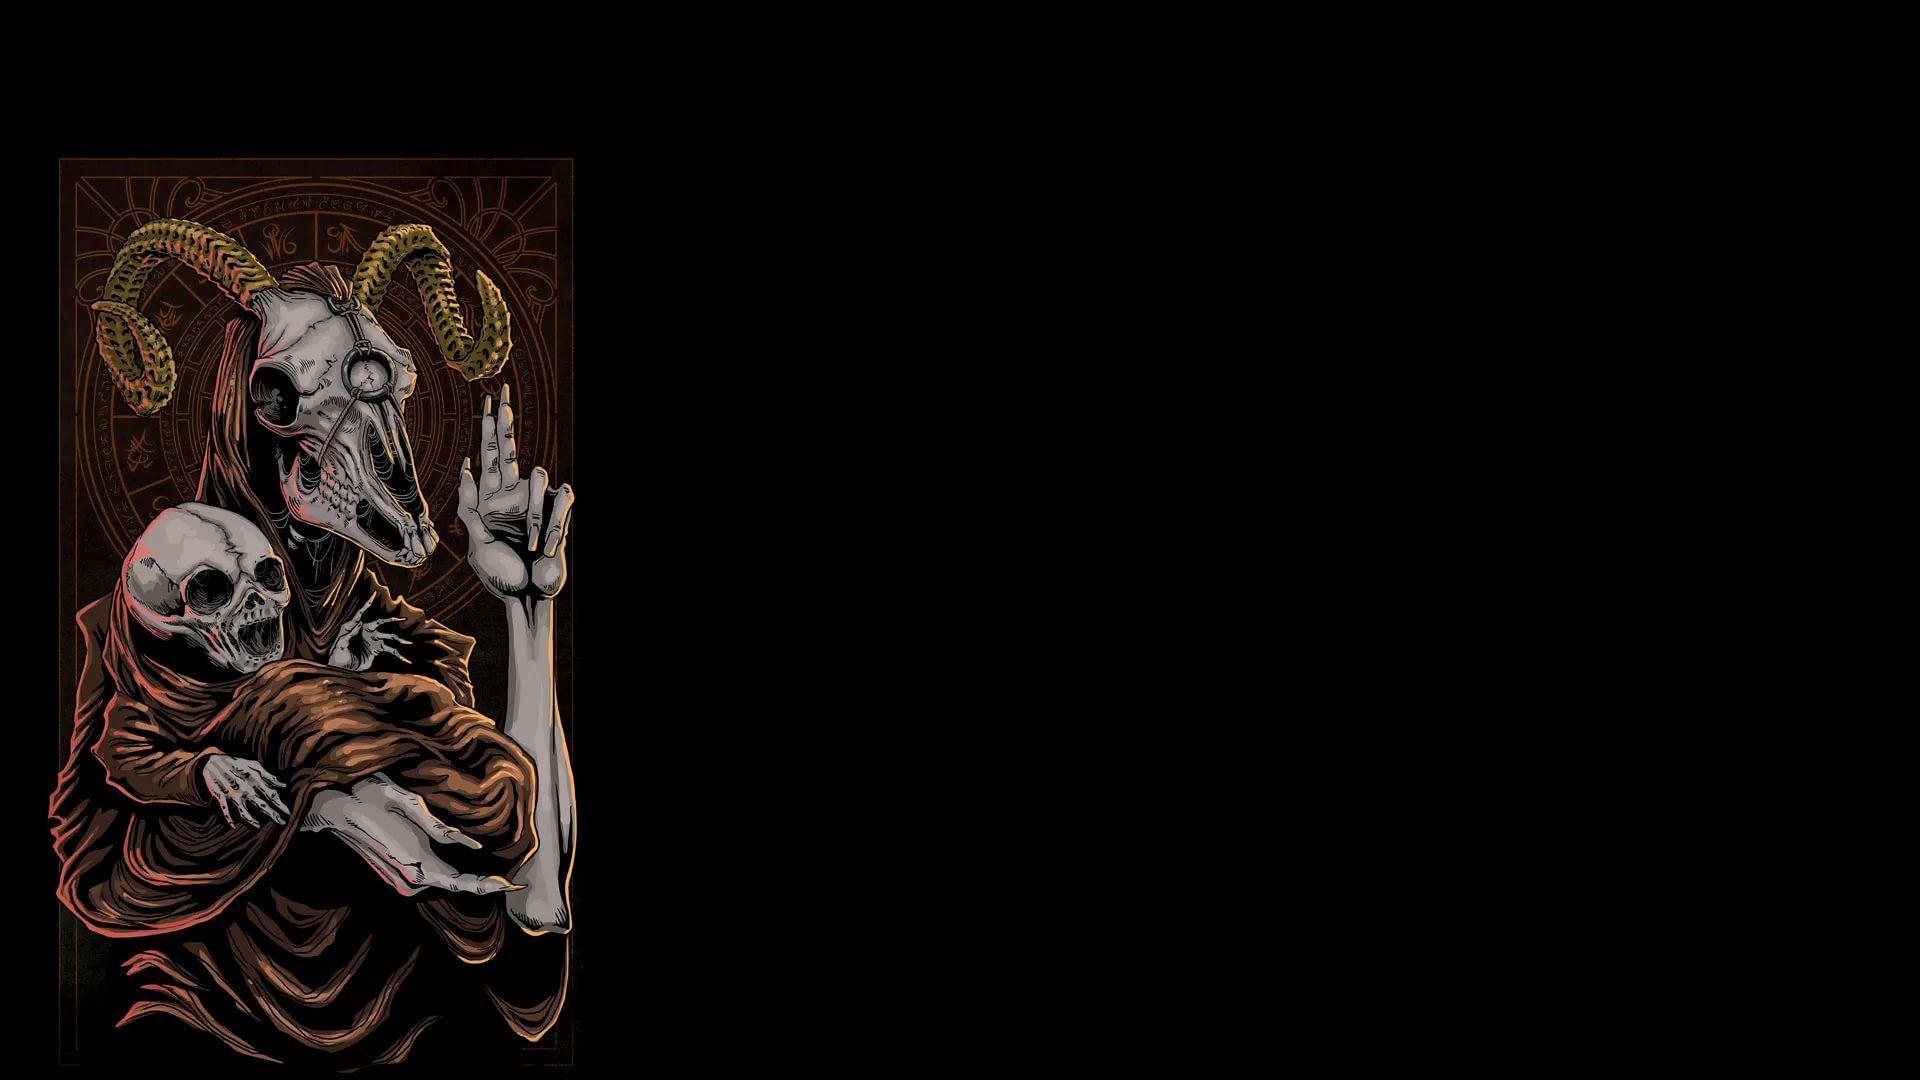 Satanic vertical wallpaper hd